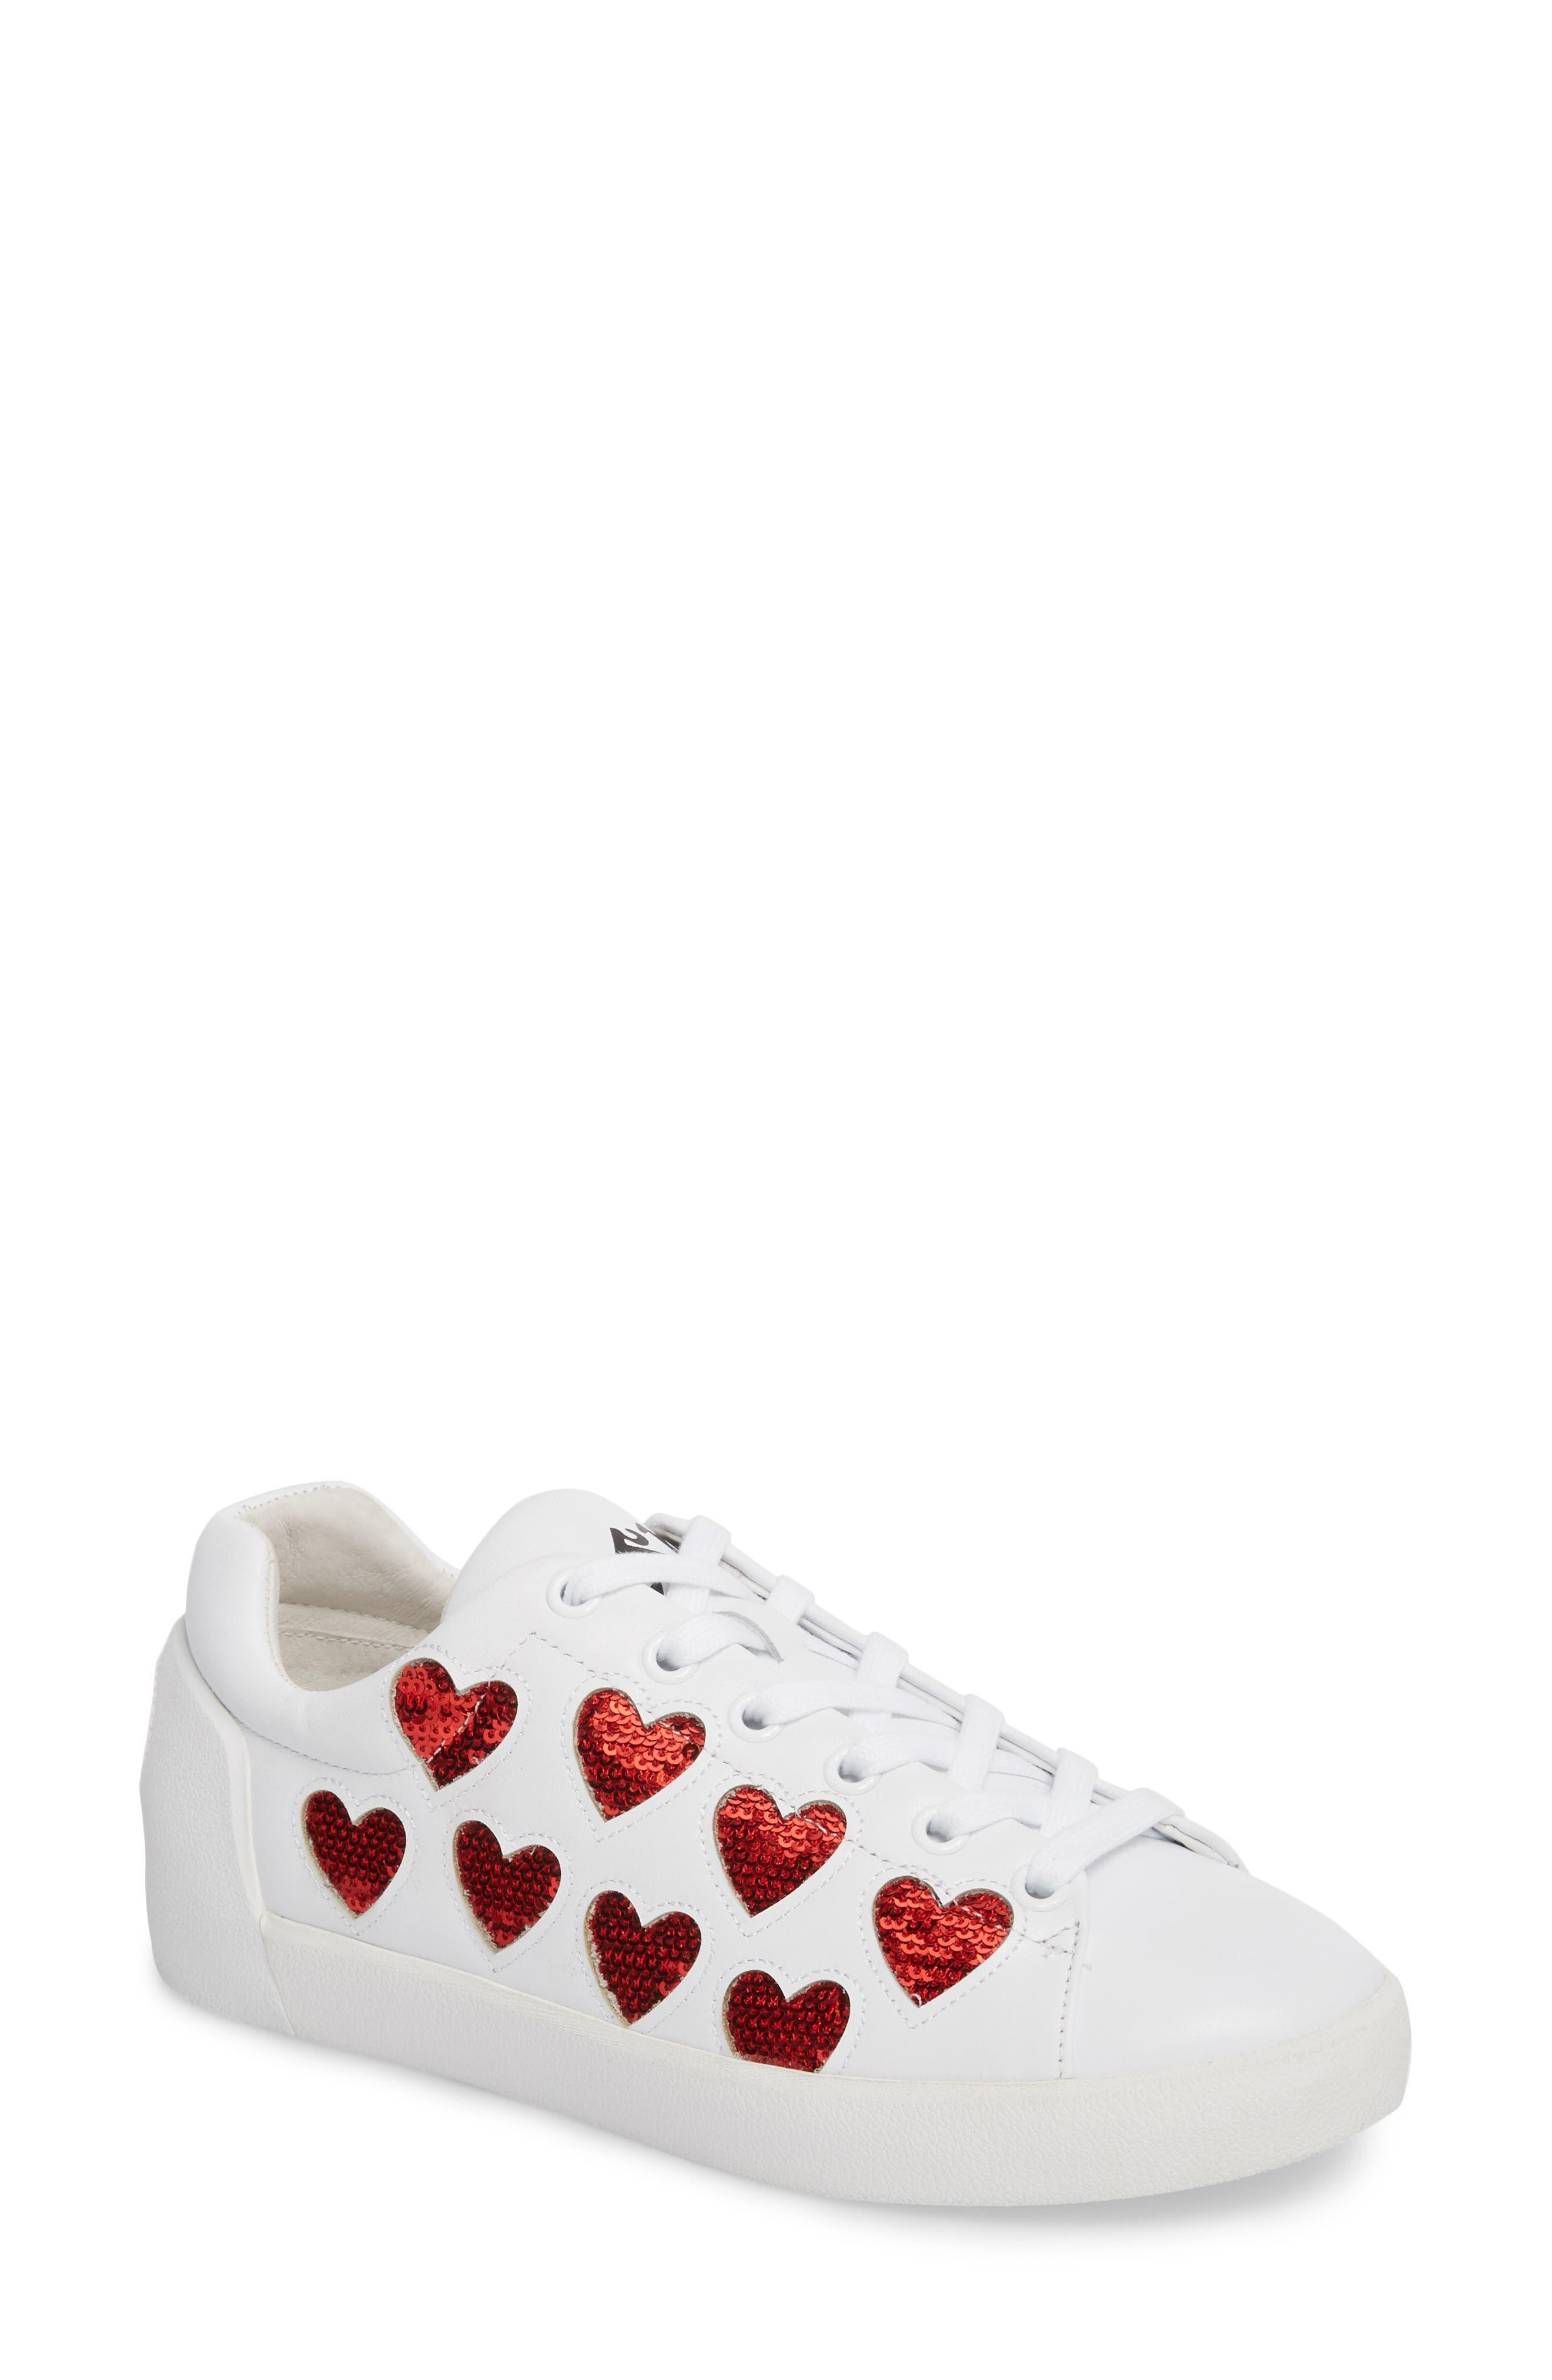 Nikita Sneaker,                         Main,                         color, White/ Red